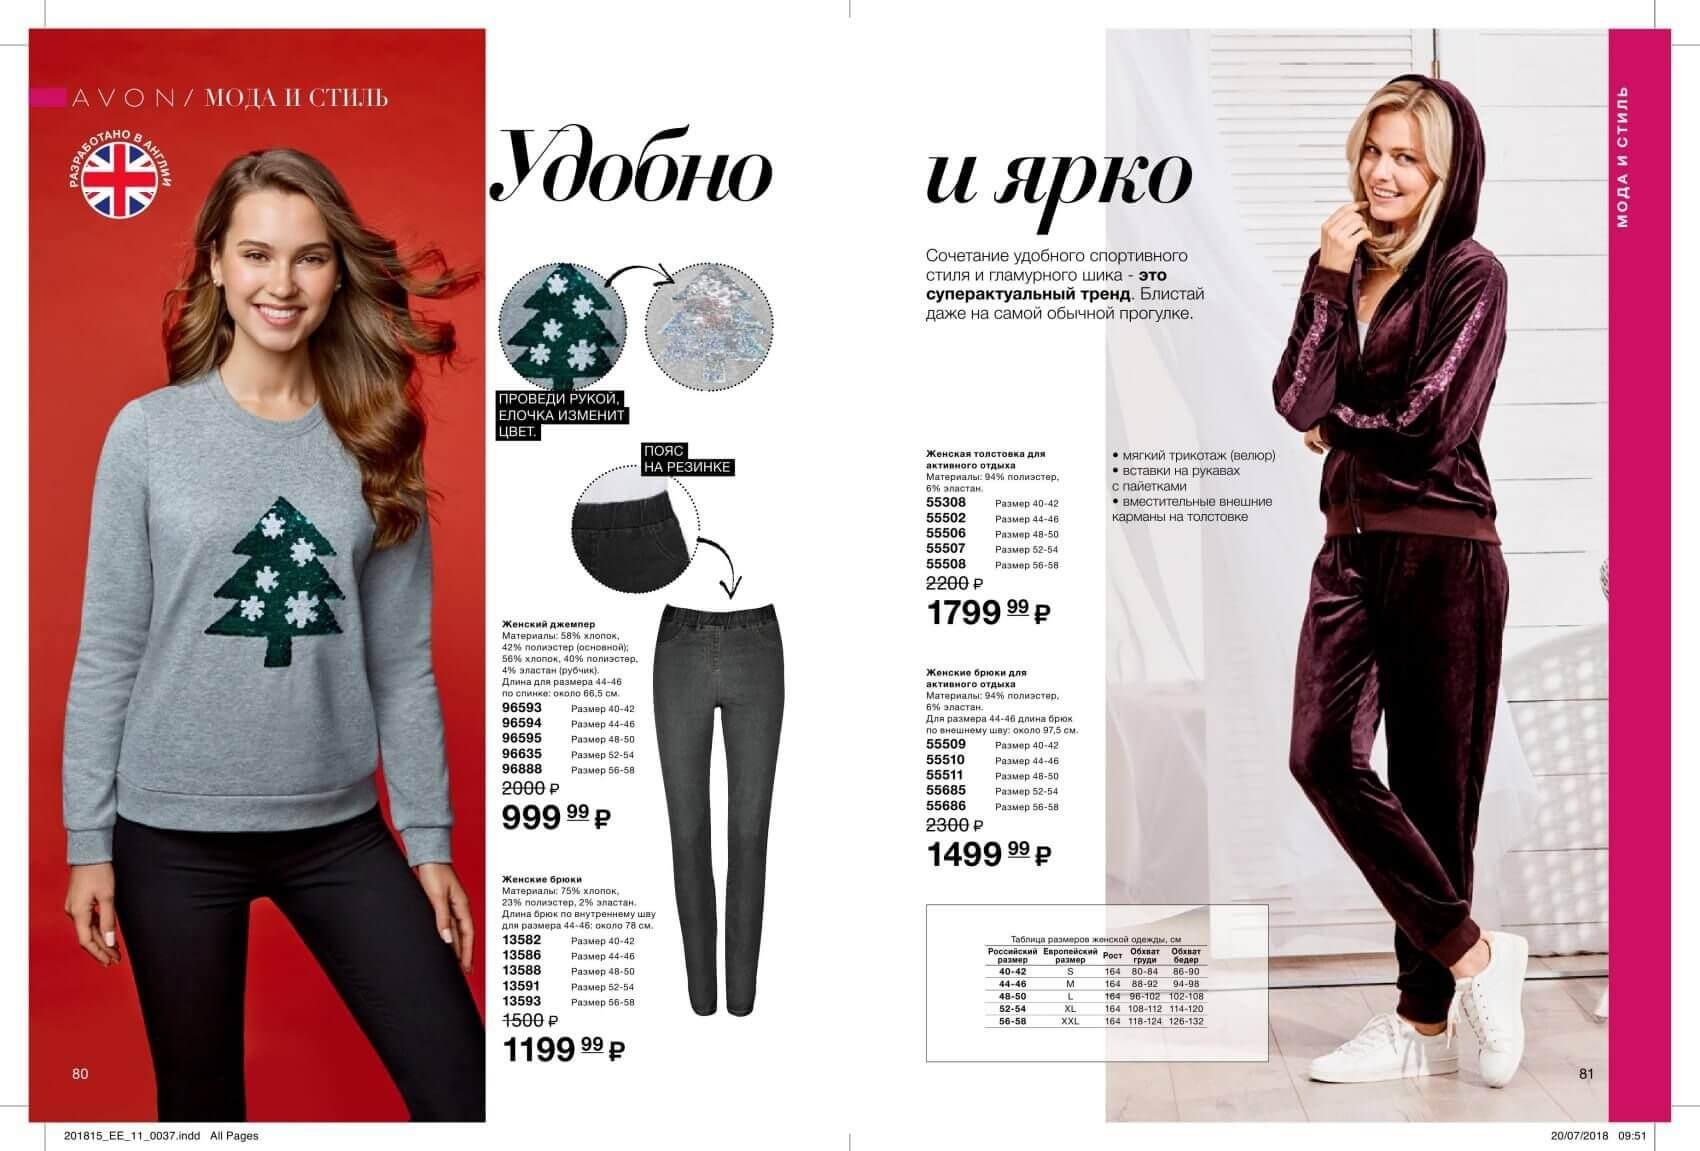 Avon каталог одежды купить косметику styx naturcosmetic